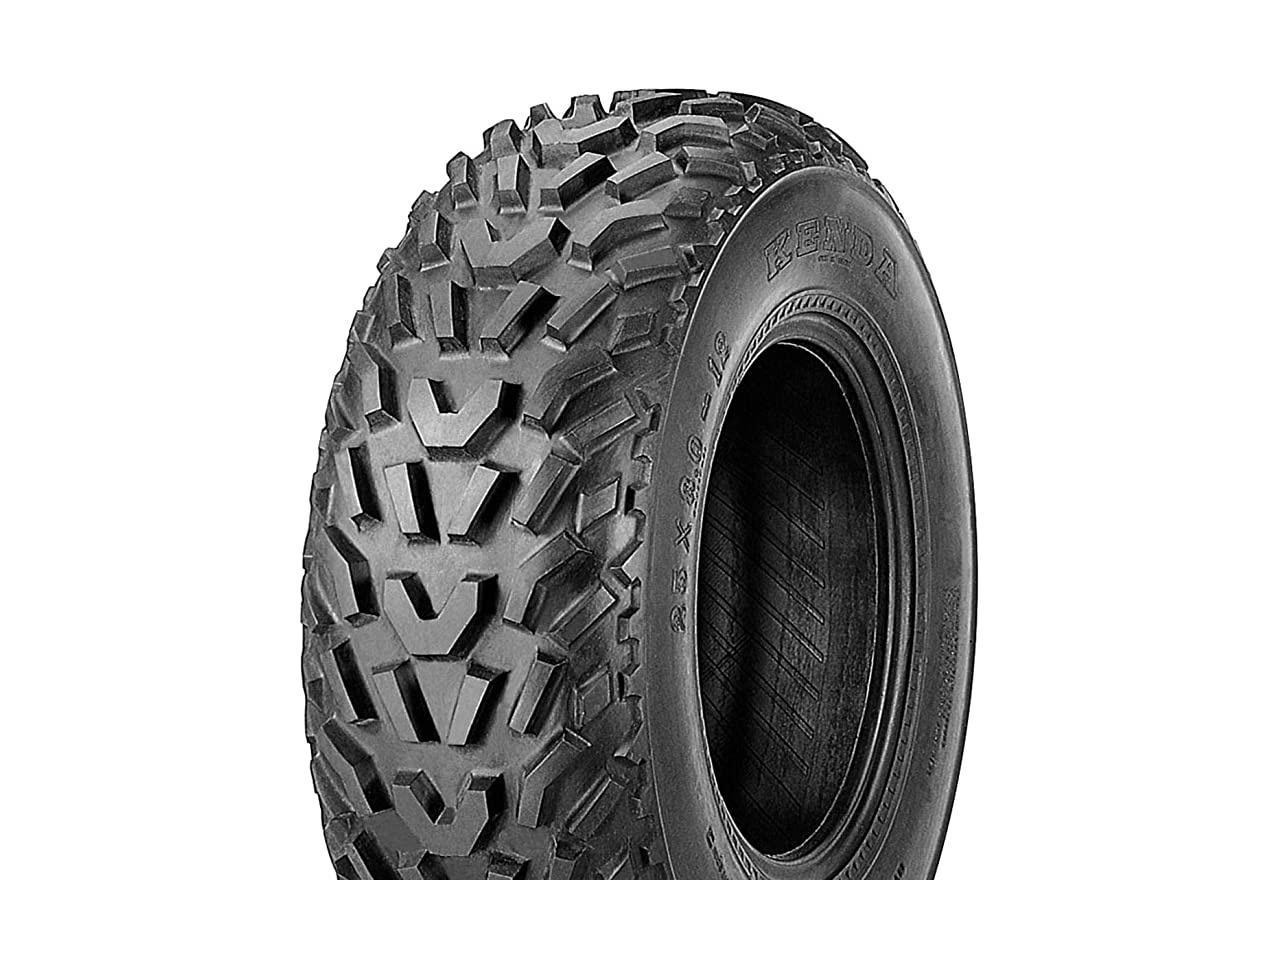 Kenda Pathfinder 2 Ply 16-8.00-7 K530 ATV Tire Tires Automotive ...